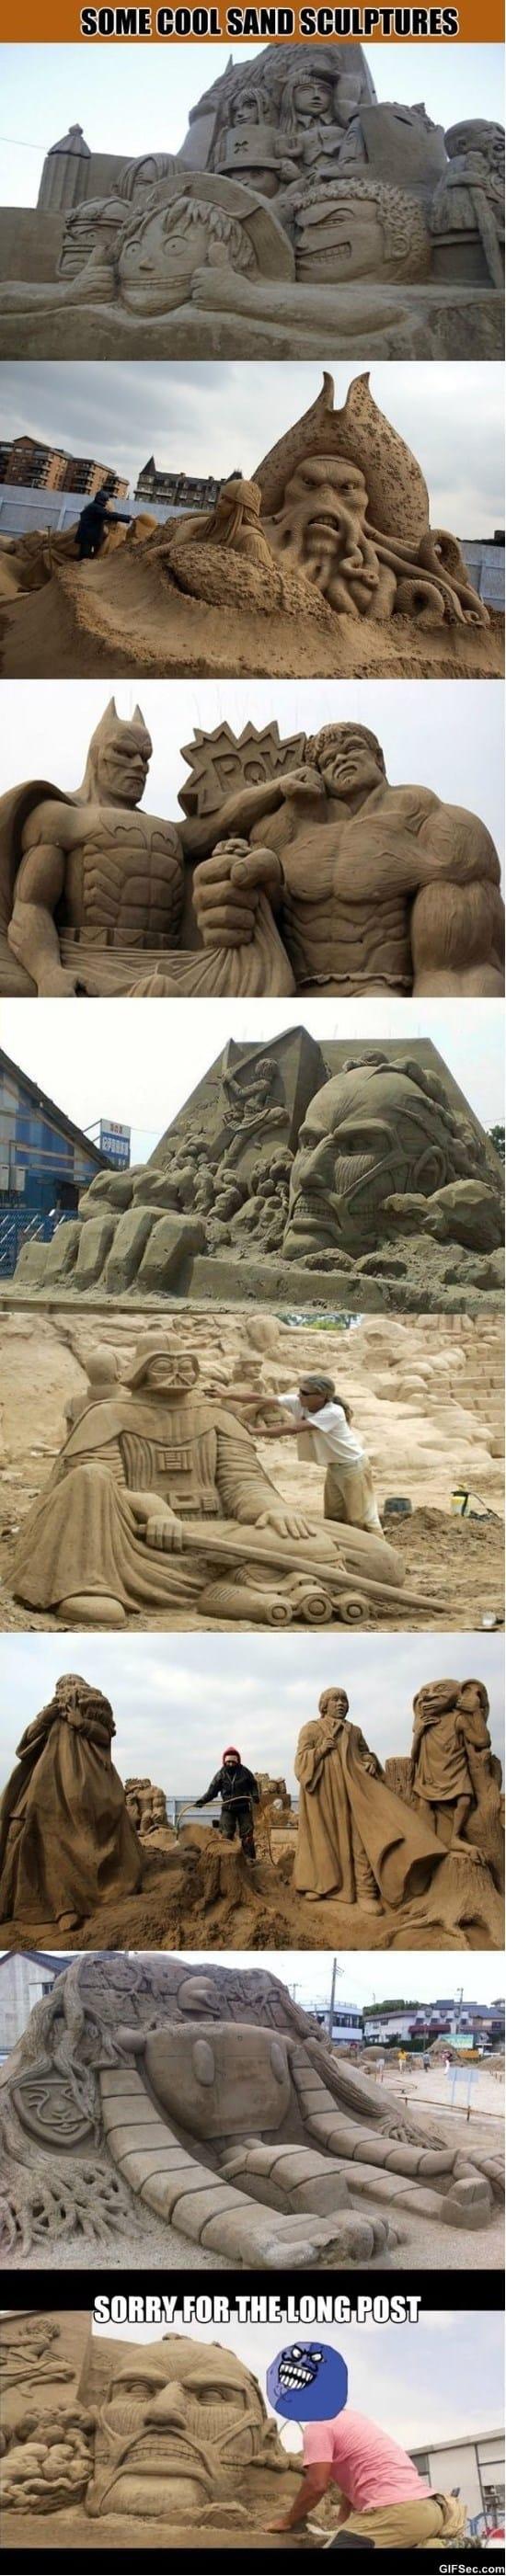 cool-sand-sculptures-meme